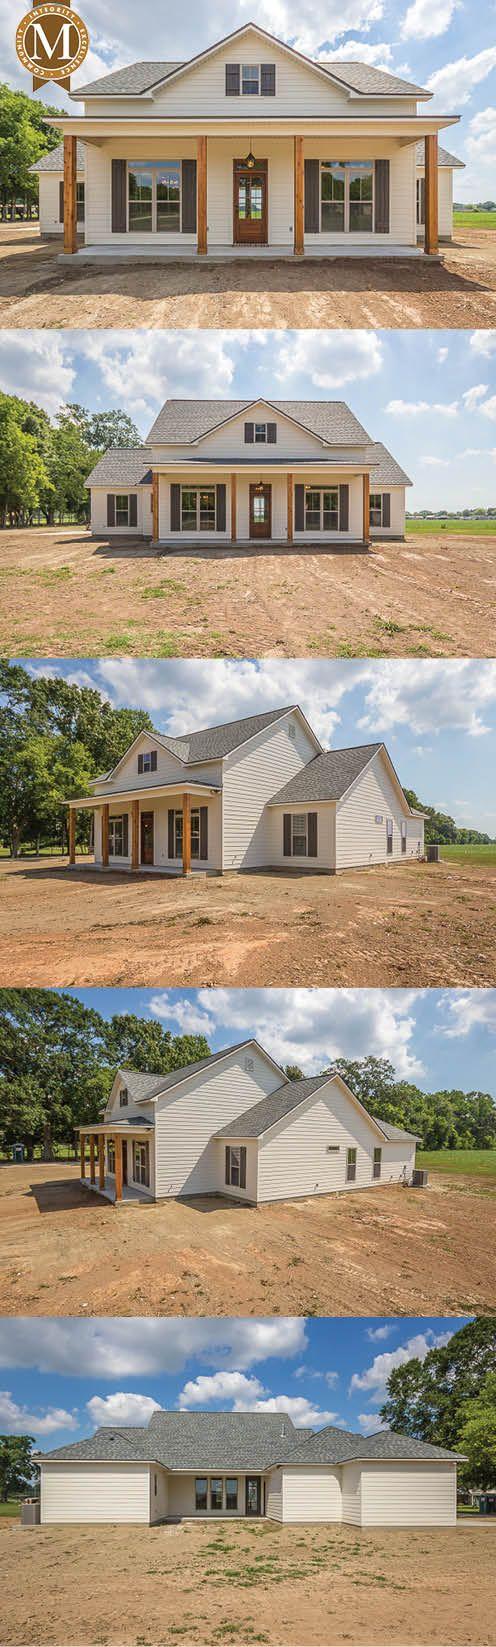 Sterling Farmhouse - Living Sq Ft: 2,206 Bedrooms: 3 or 4 Baths: 2 Lafayette Lake Charles Baton Rouge Louisiana #barndominiumideas